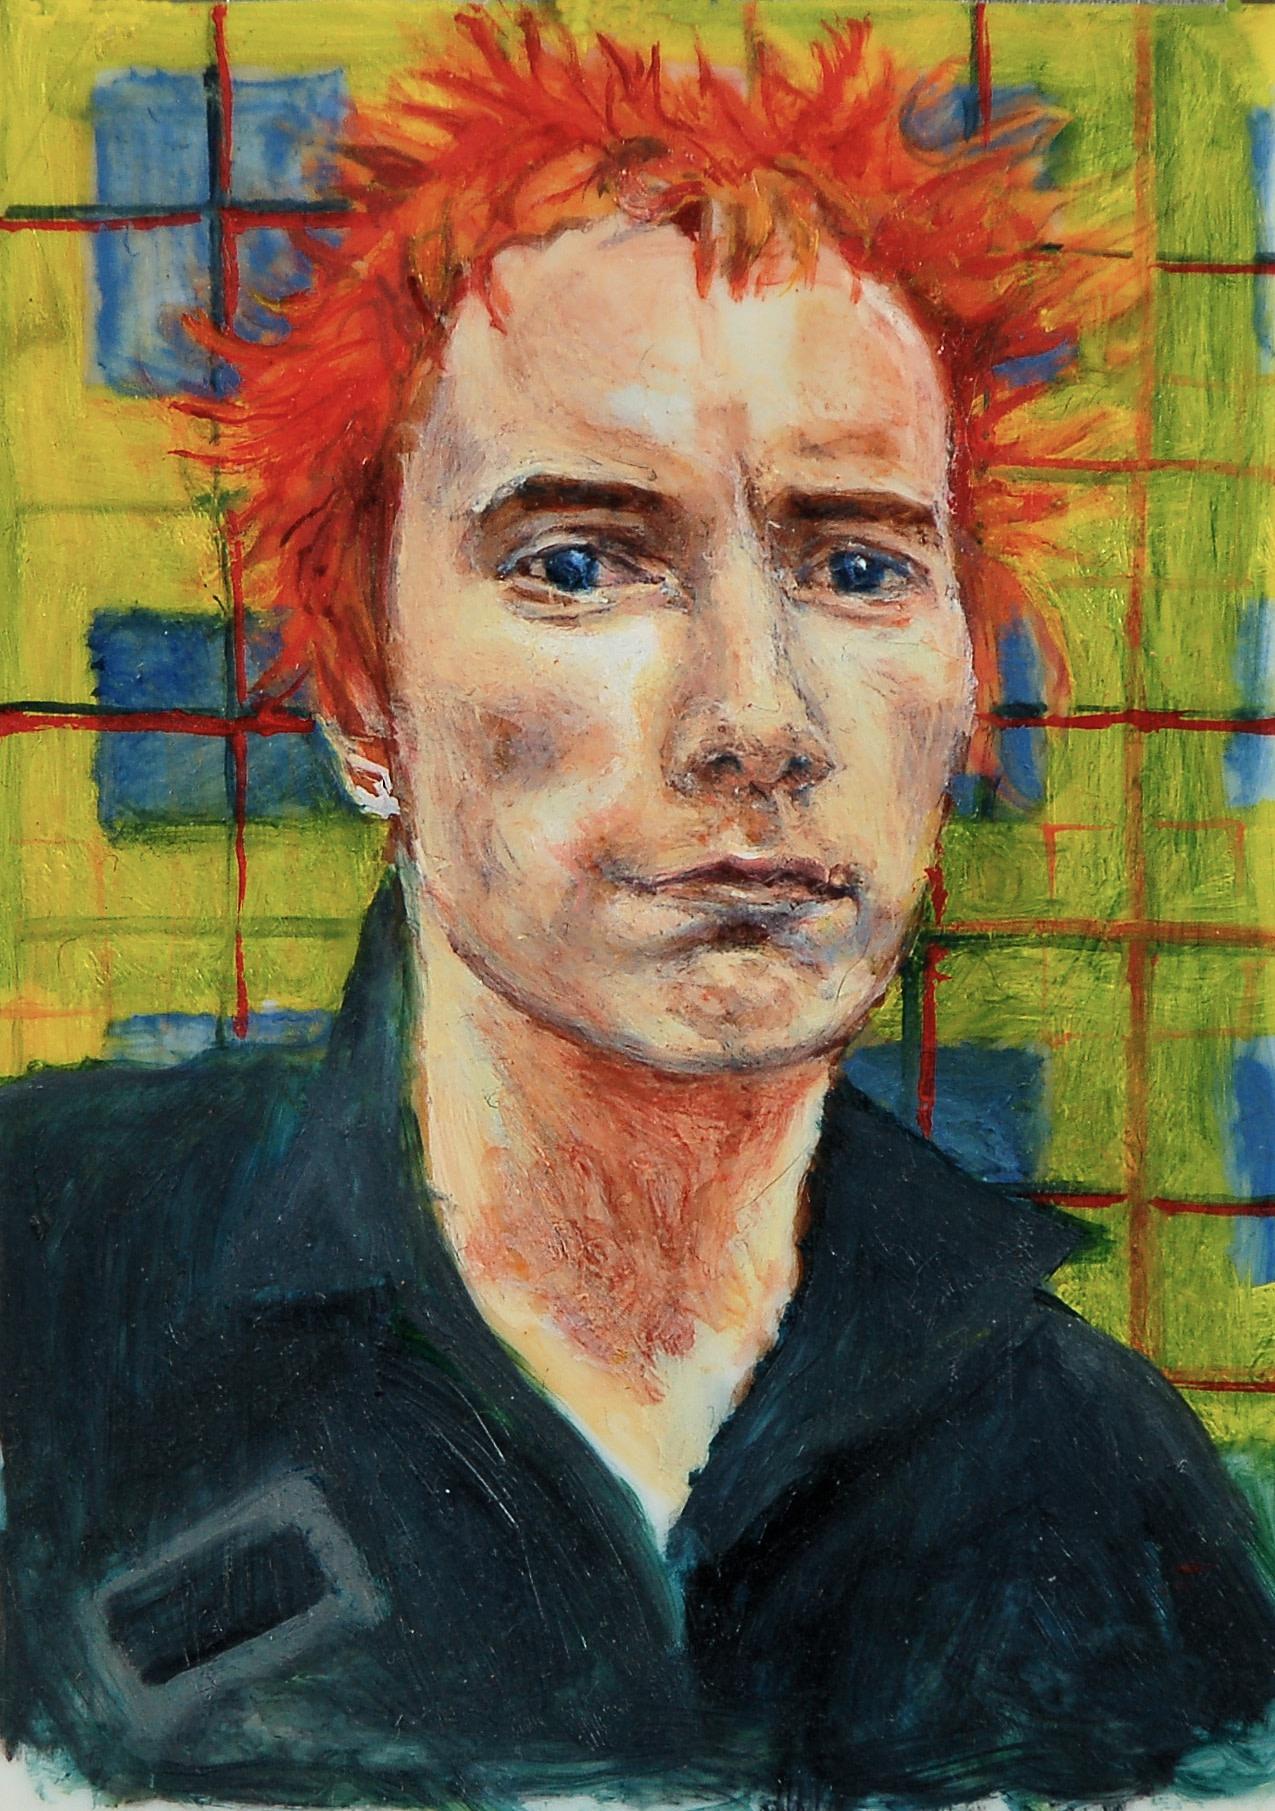 "<span class=""link fancybox-details-link""><a href=""/exhibitions/22/works/artworks_standalone11104/"">View Detail Page</a></span><div class=""artist""><span class=""artist""><strong>Caroline Macey ARE</strong></span></div><div class=""title""><em>Johnny</em></div><div class=""medium"">oil paint on ivorine</div><div class=""dimensions"">12 x 9 cm framed<br>9.5 x 6.5 cm image size</div>"